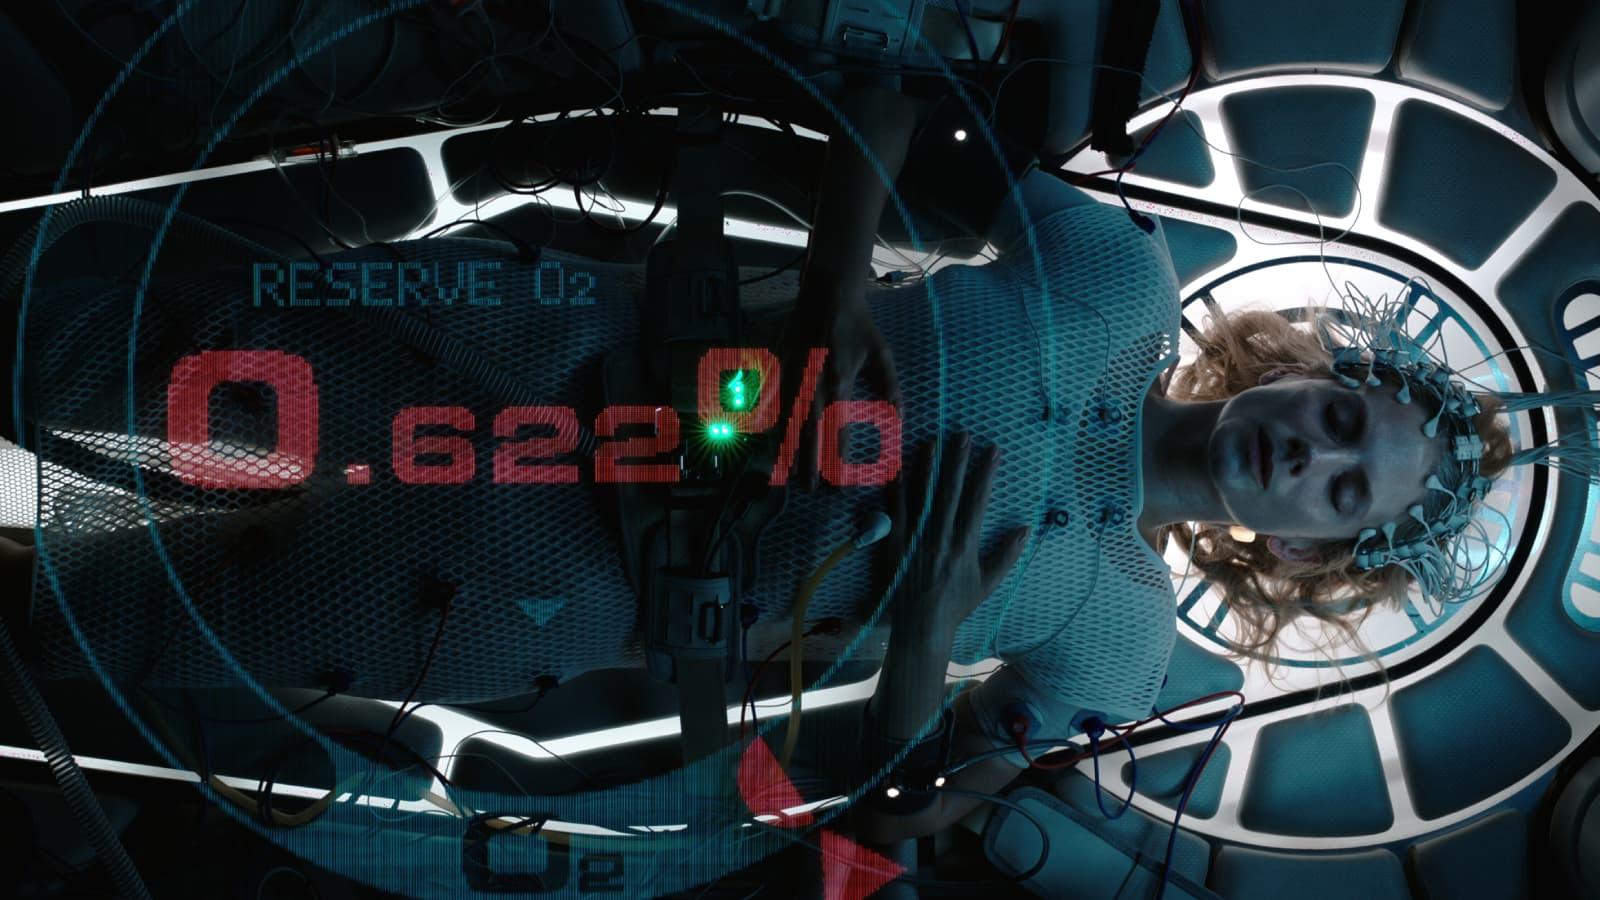 Oxygène, un thriller sci-fi haletant sur Netflix